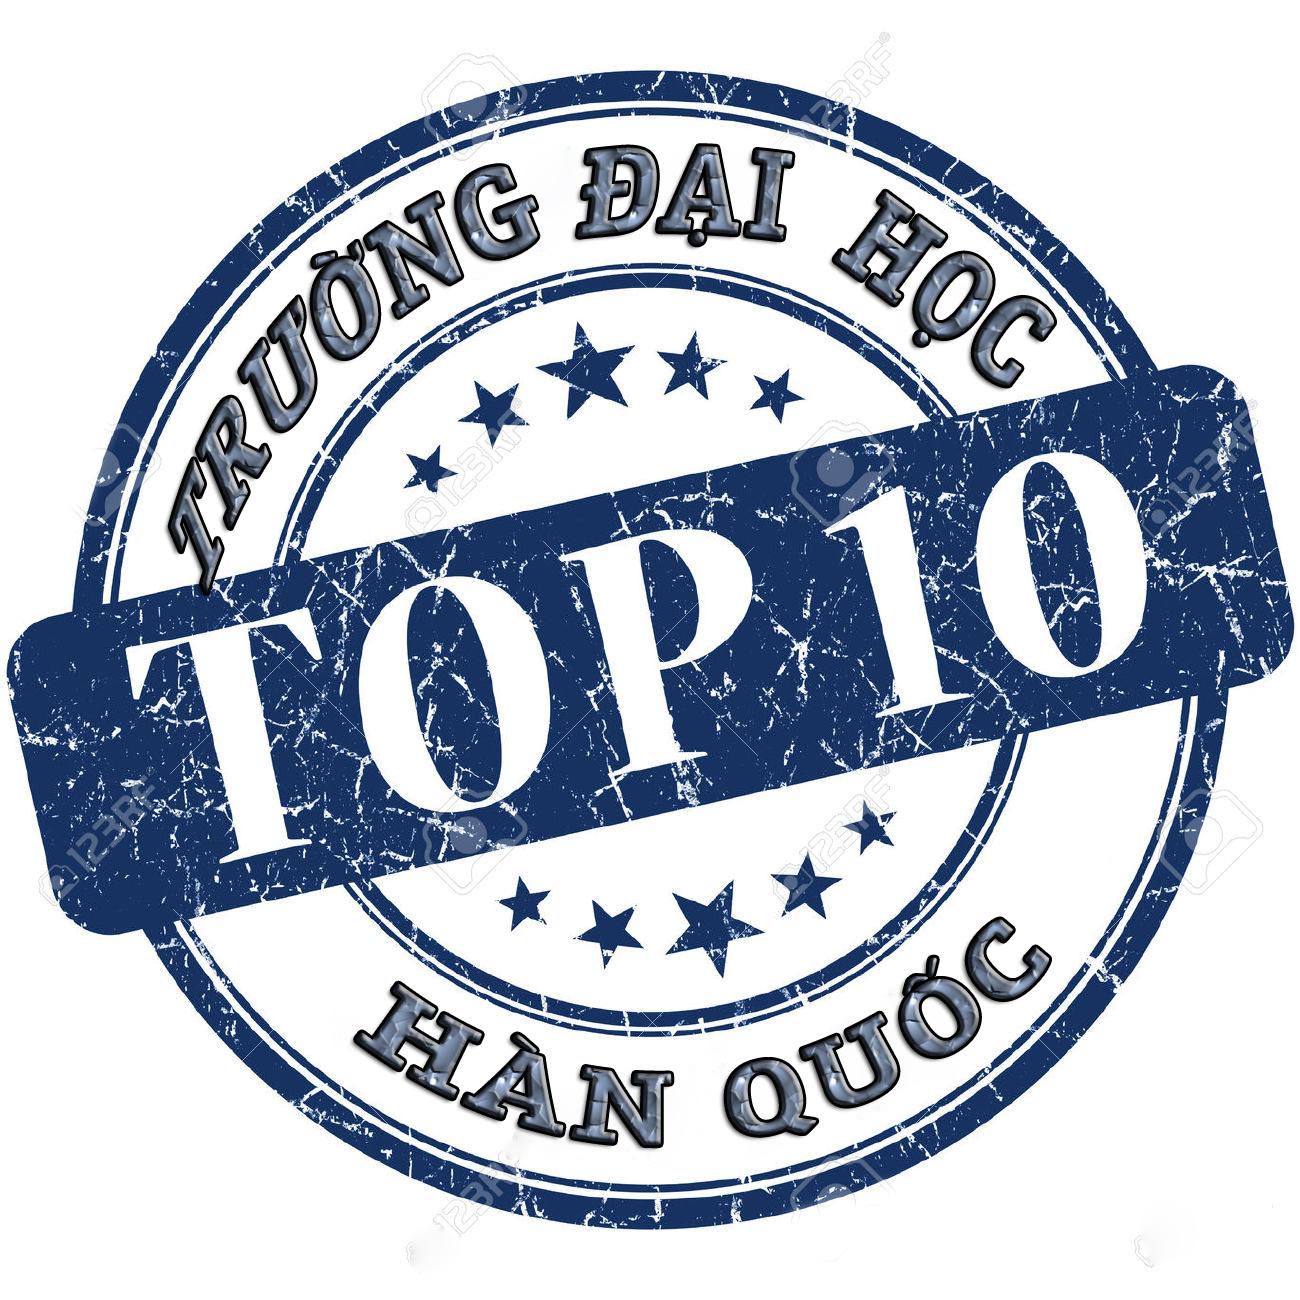 top-10-truong-dai-hoc-han-quoc-halo